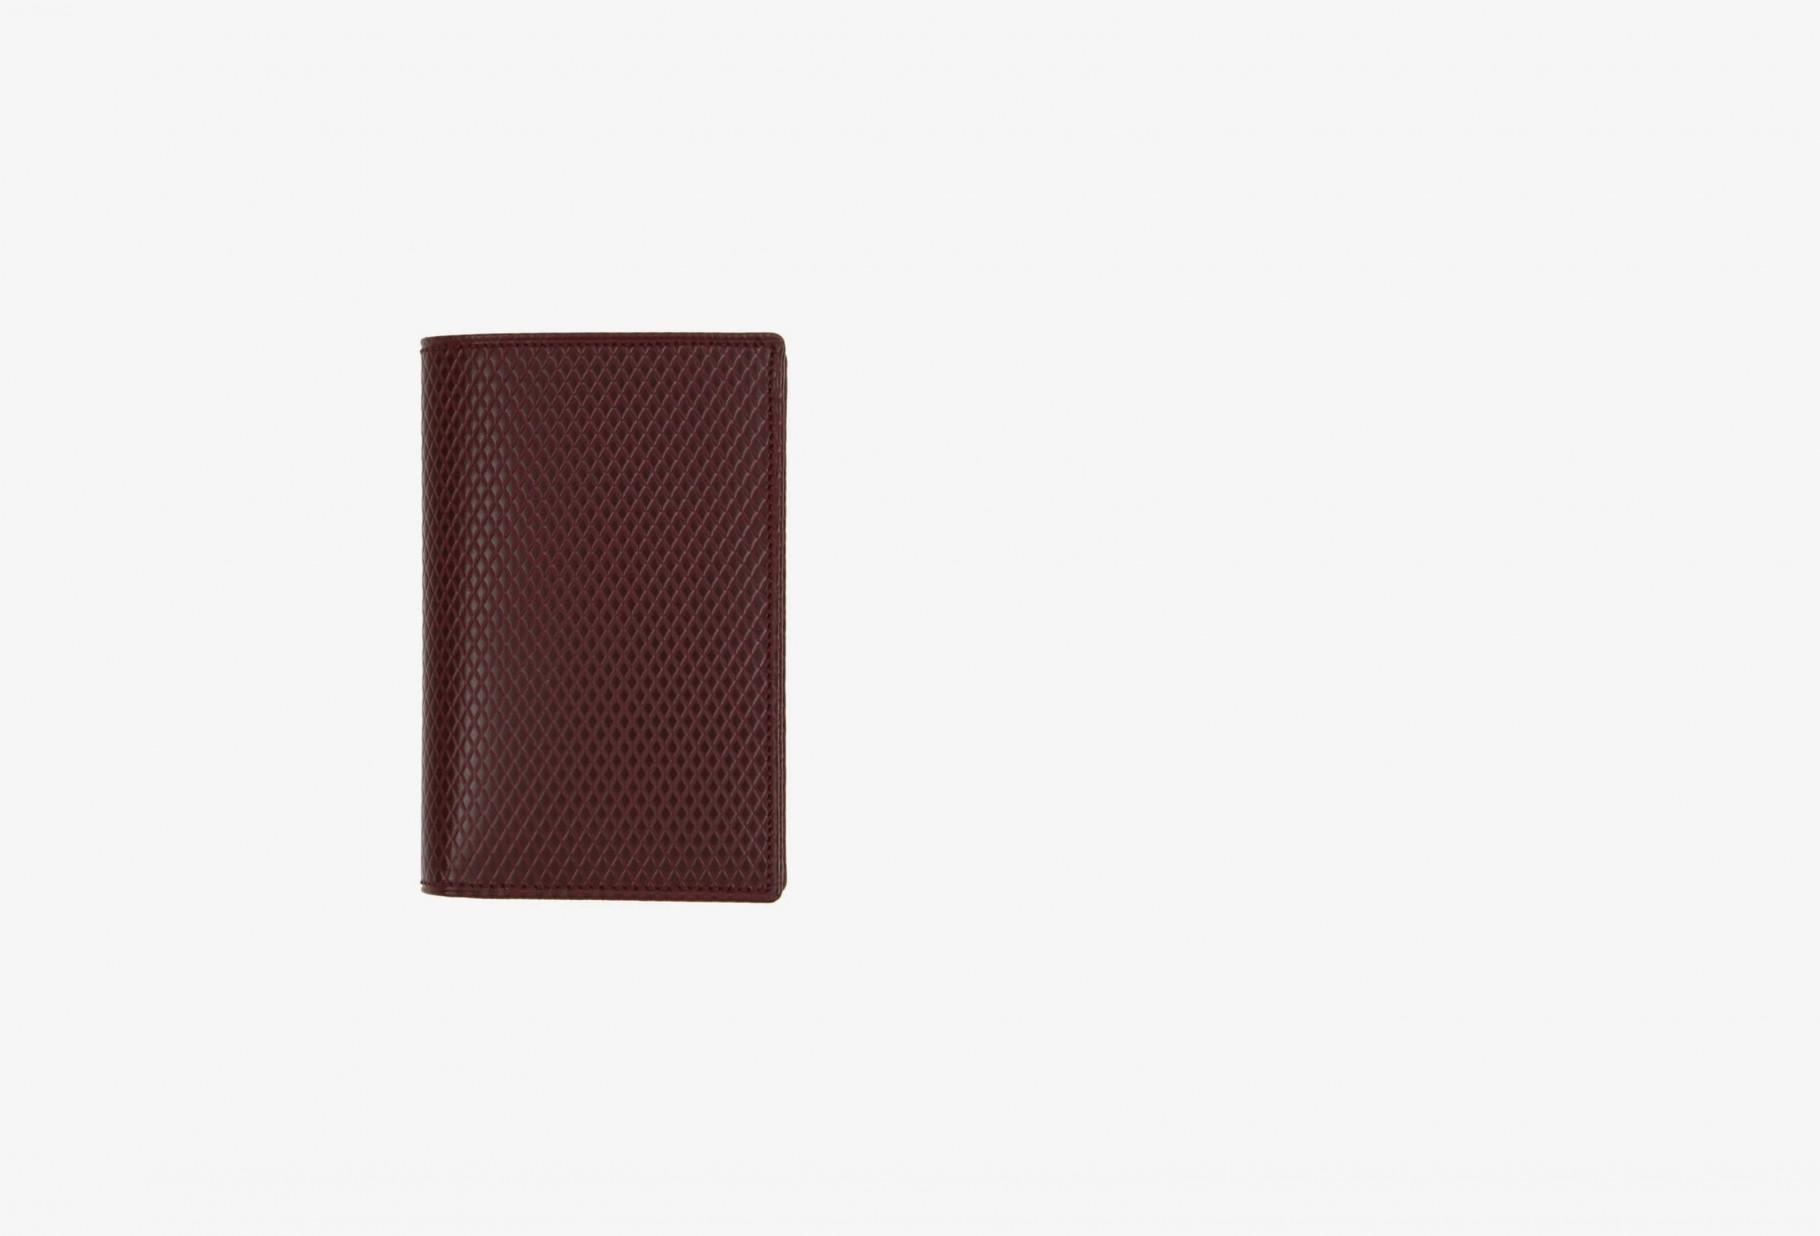 COMME DES GARÇONS WALLETS / Cdg luxury group sa6400lg Burgundy